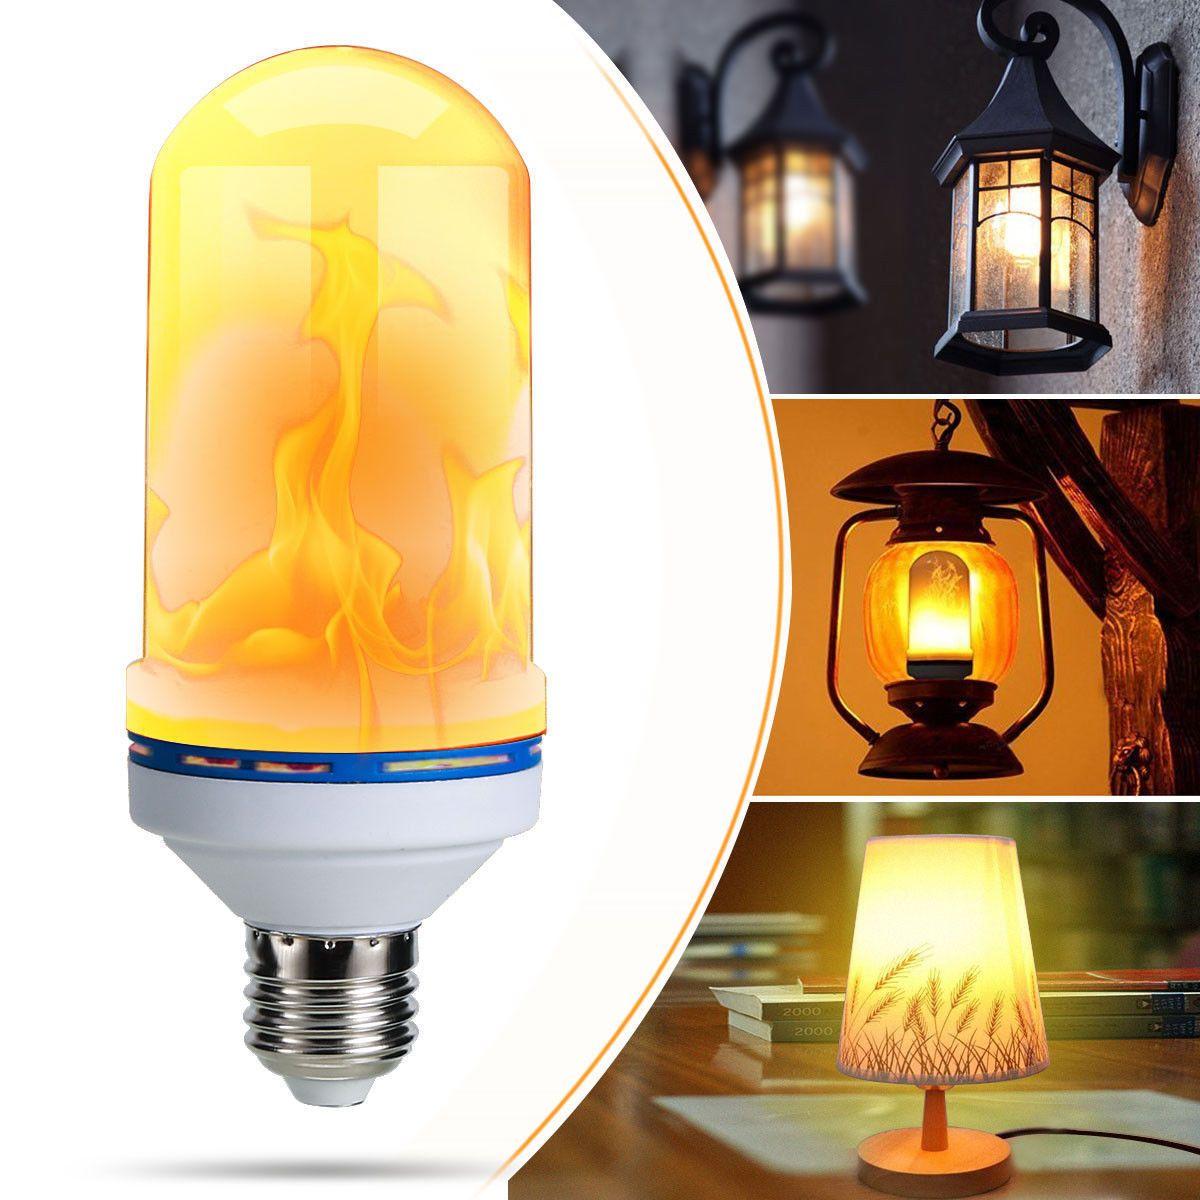 1 0aud E27 B22 6 5w Led Burning Light Flicker Flame Lamp Bulb Fire Effect Decorative Ebay Light Bulb Lamp Light Bulb Candle Decorative Light Bulbs